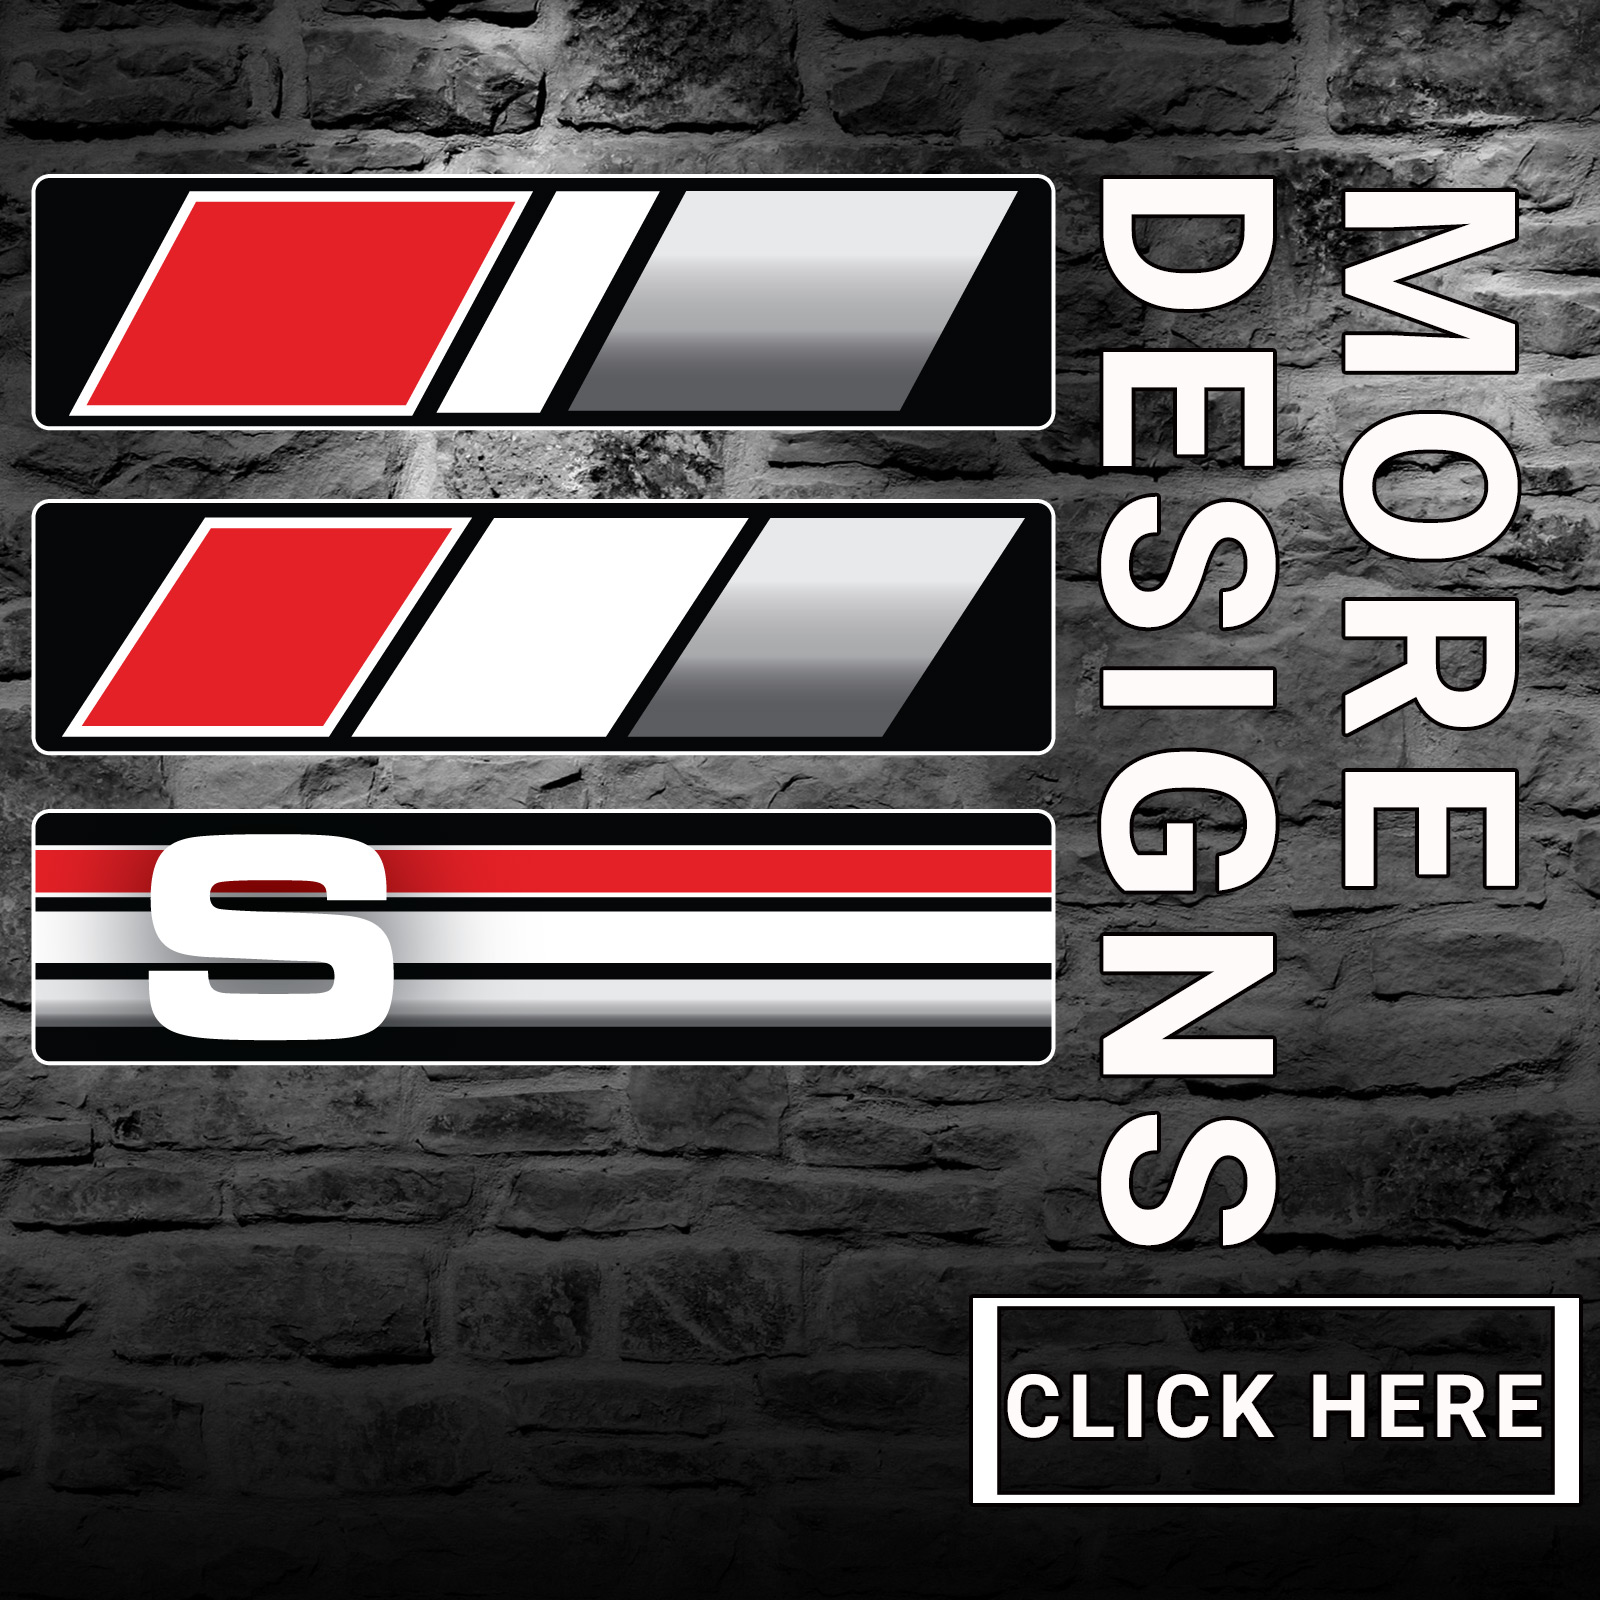 audi a3 car mats s3 not sportback 2012 s line luxury. Black Bedroom Furniture Sets. Home Design Ideas